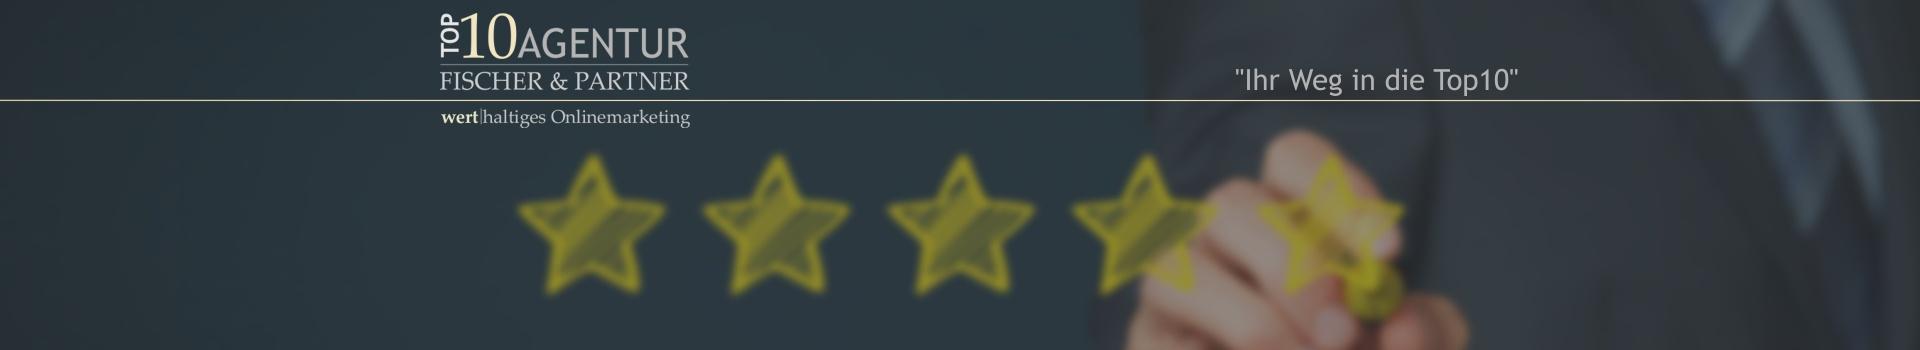 Top10 Sternebewertung